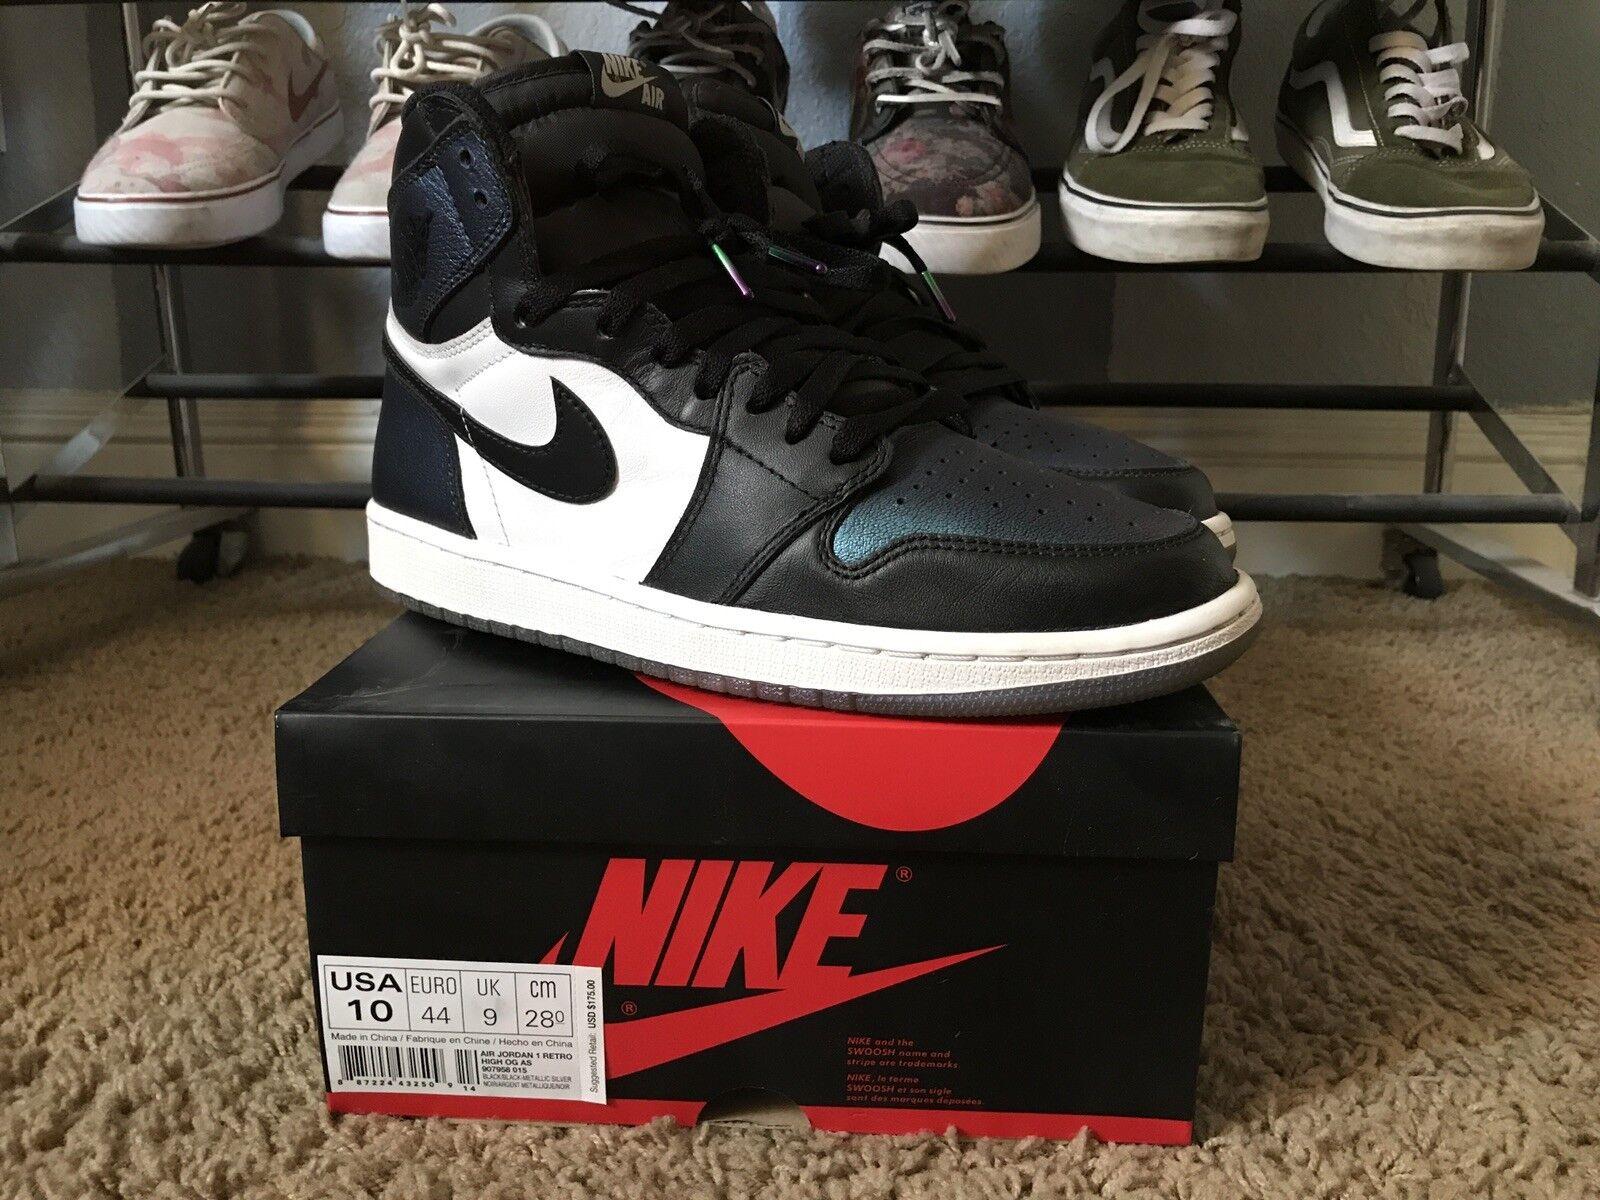 wholesale dealer e18e5 75144 Nike air jordan 1 stella camaleonte ombra sz 10 allevati ombra camaleonte  royal 6edc00